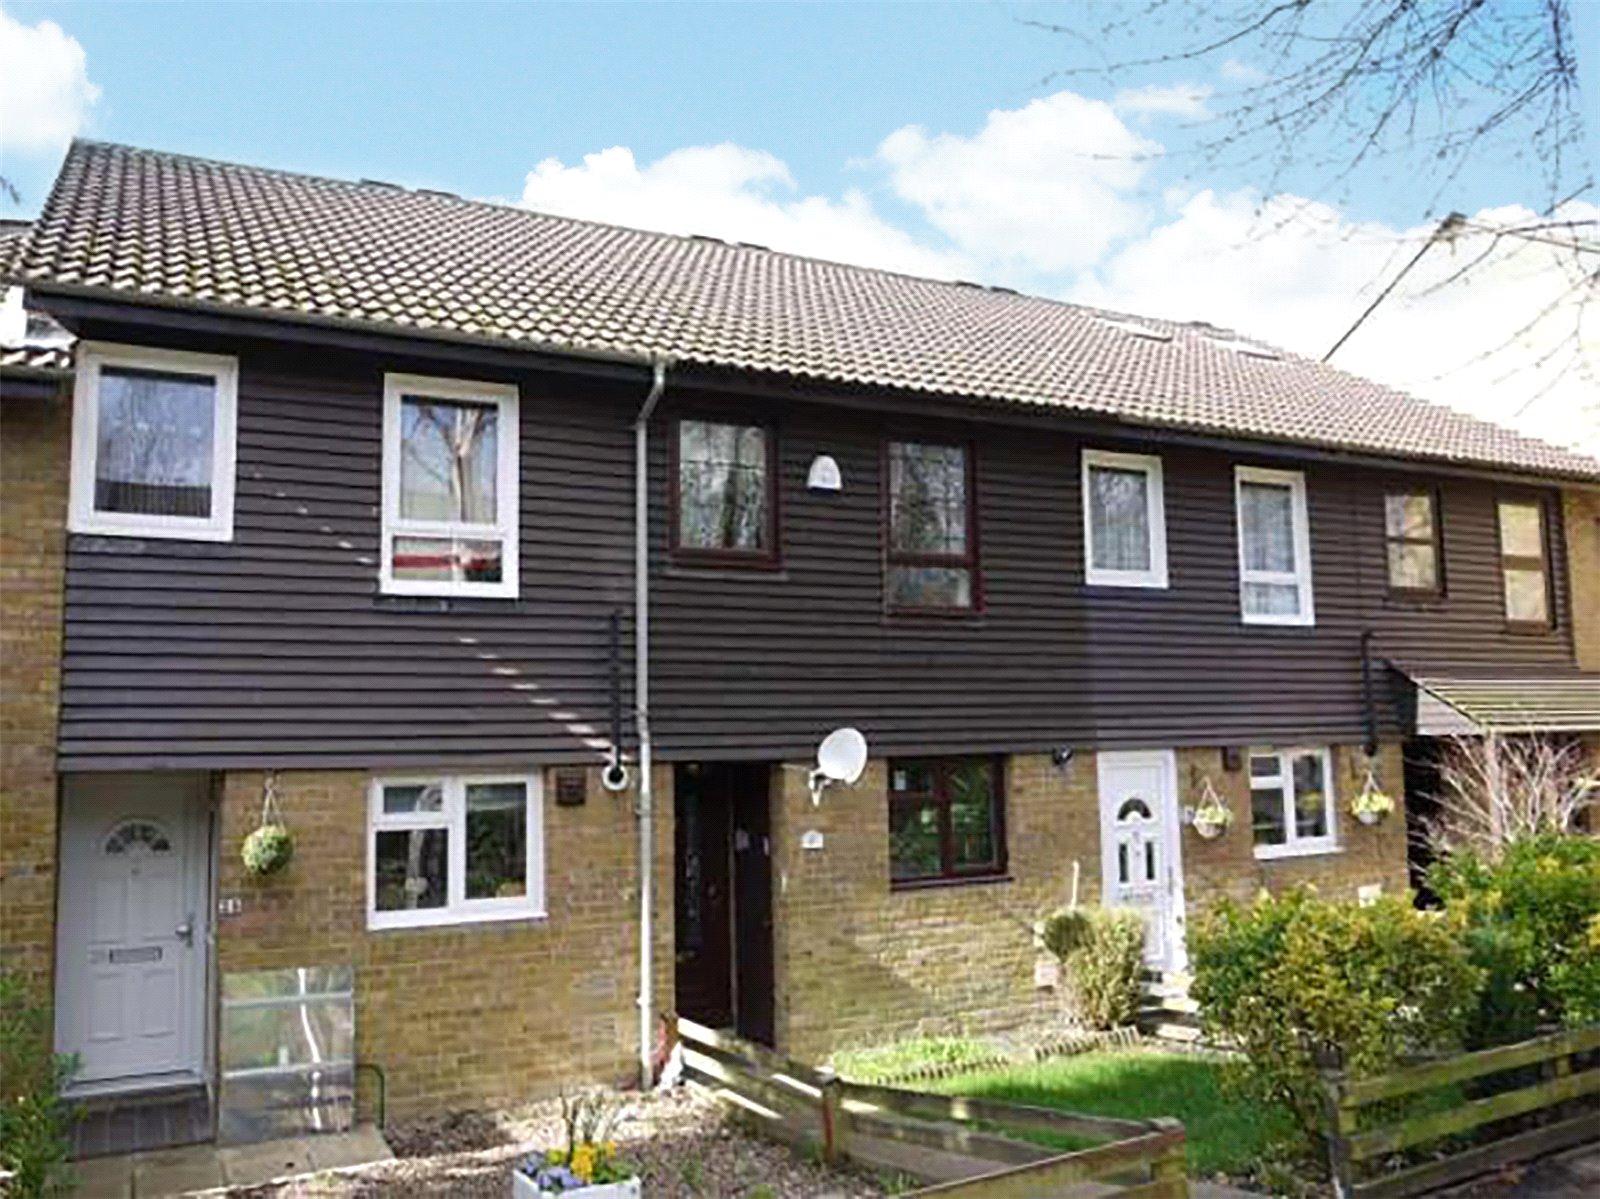 3 Bedrooms House for sale in Inchwood, Bracknell, Berkshire, RG12